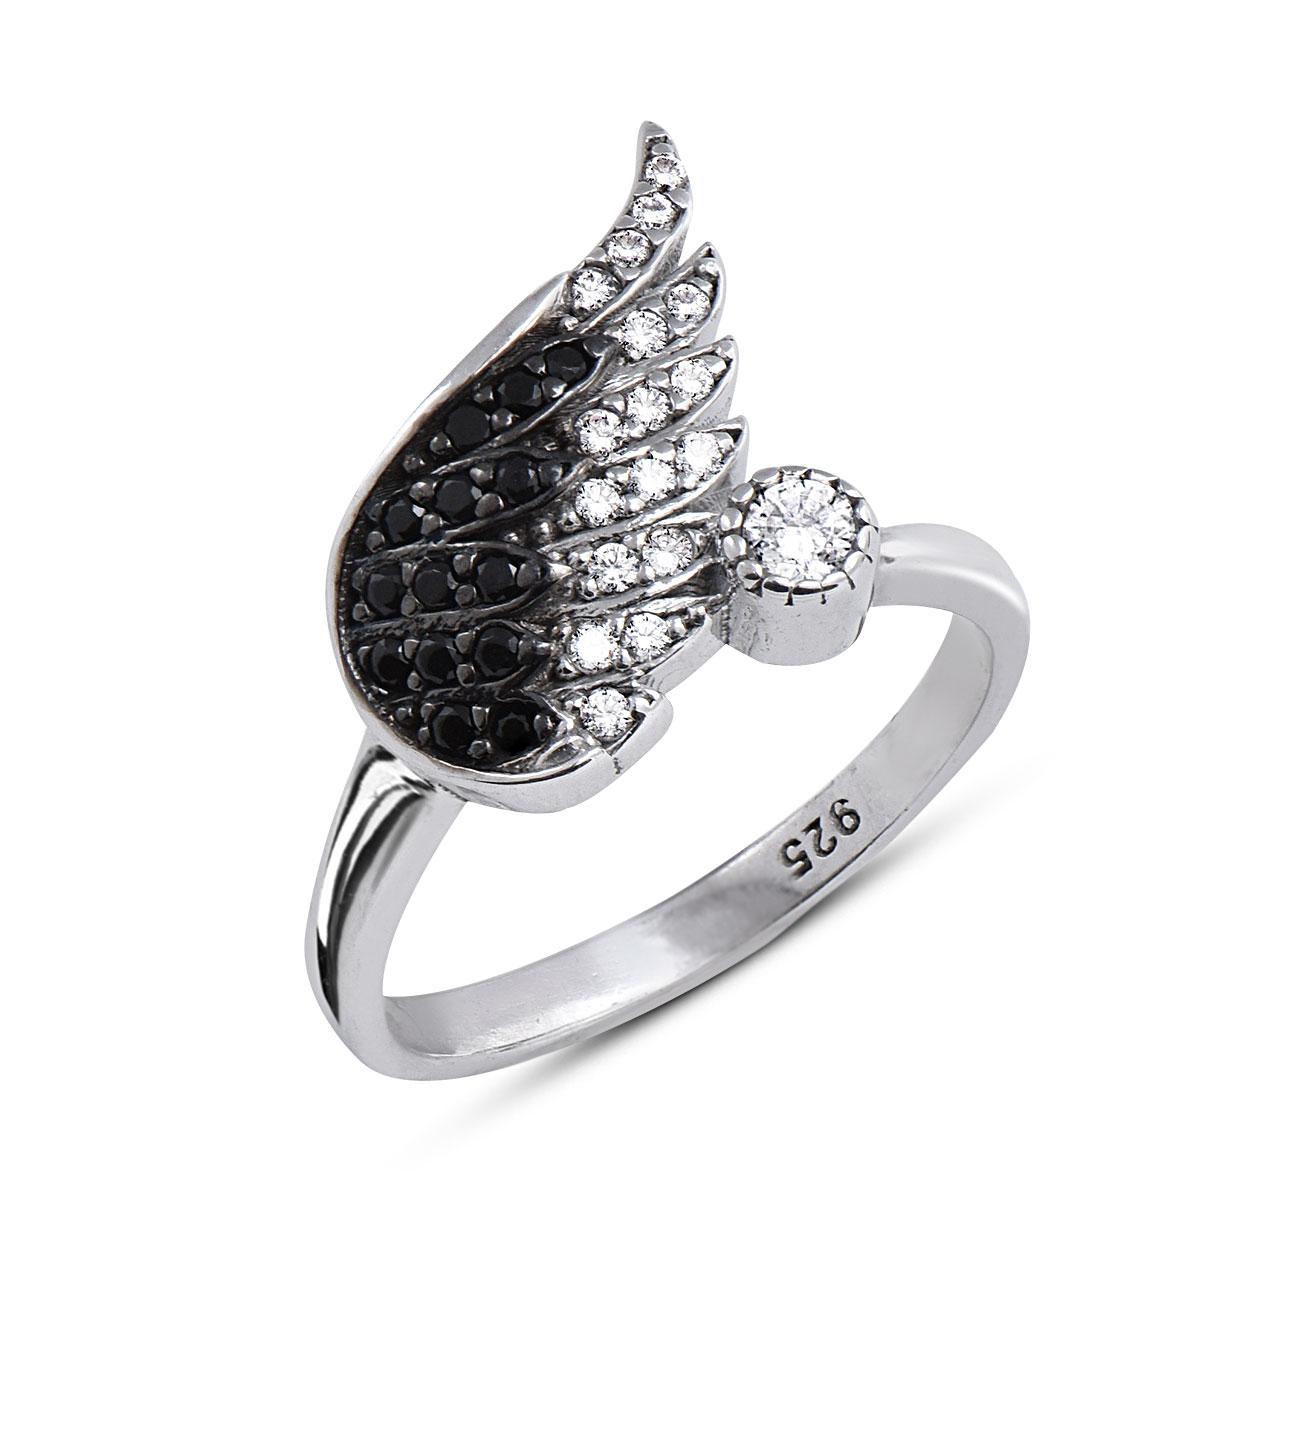 Women's Gemmed Angel Wing Design Ring